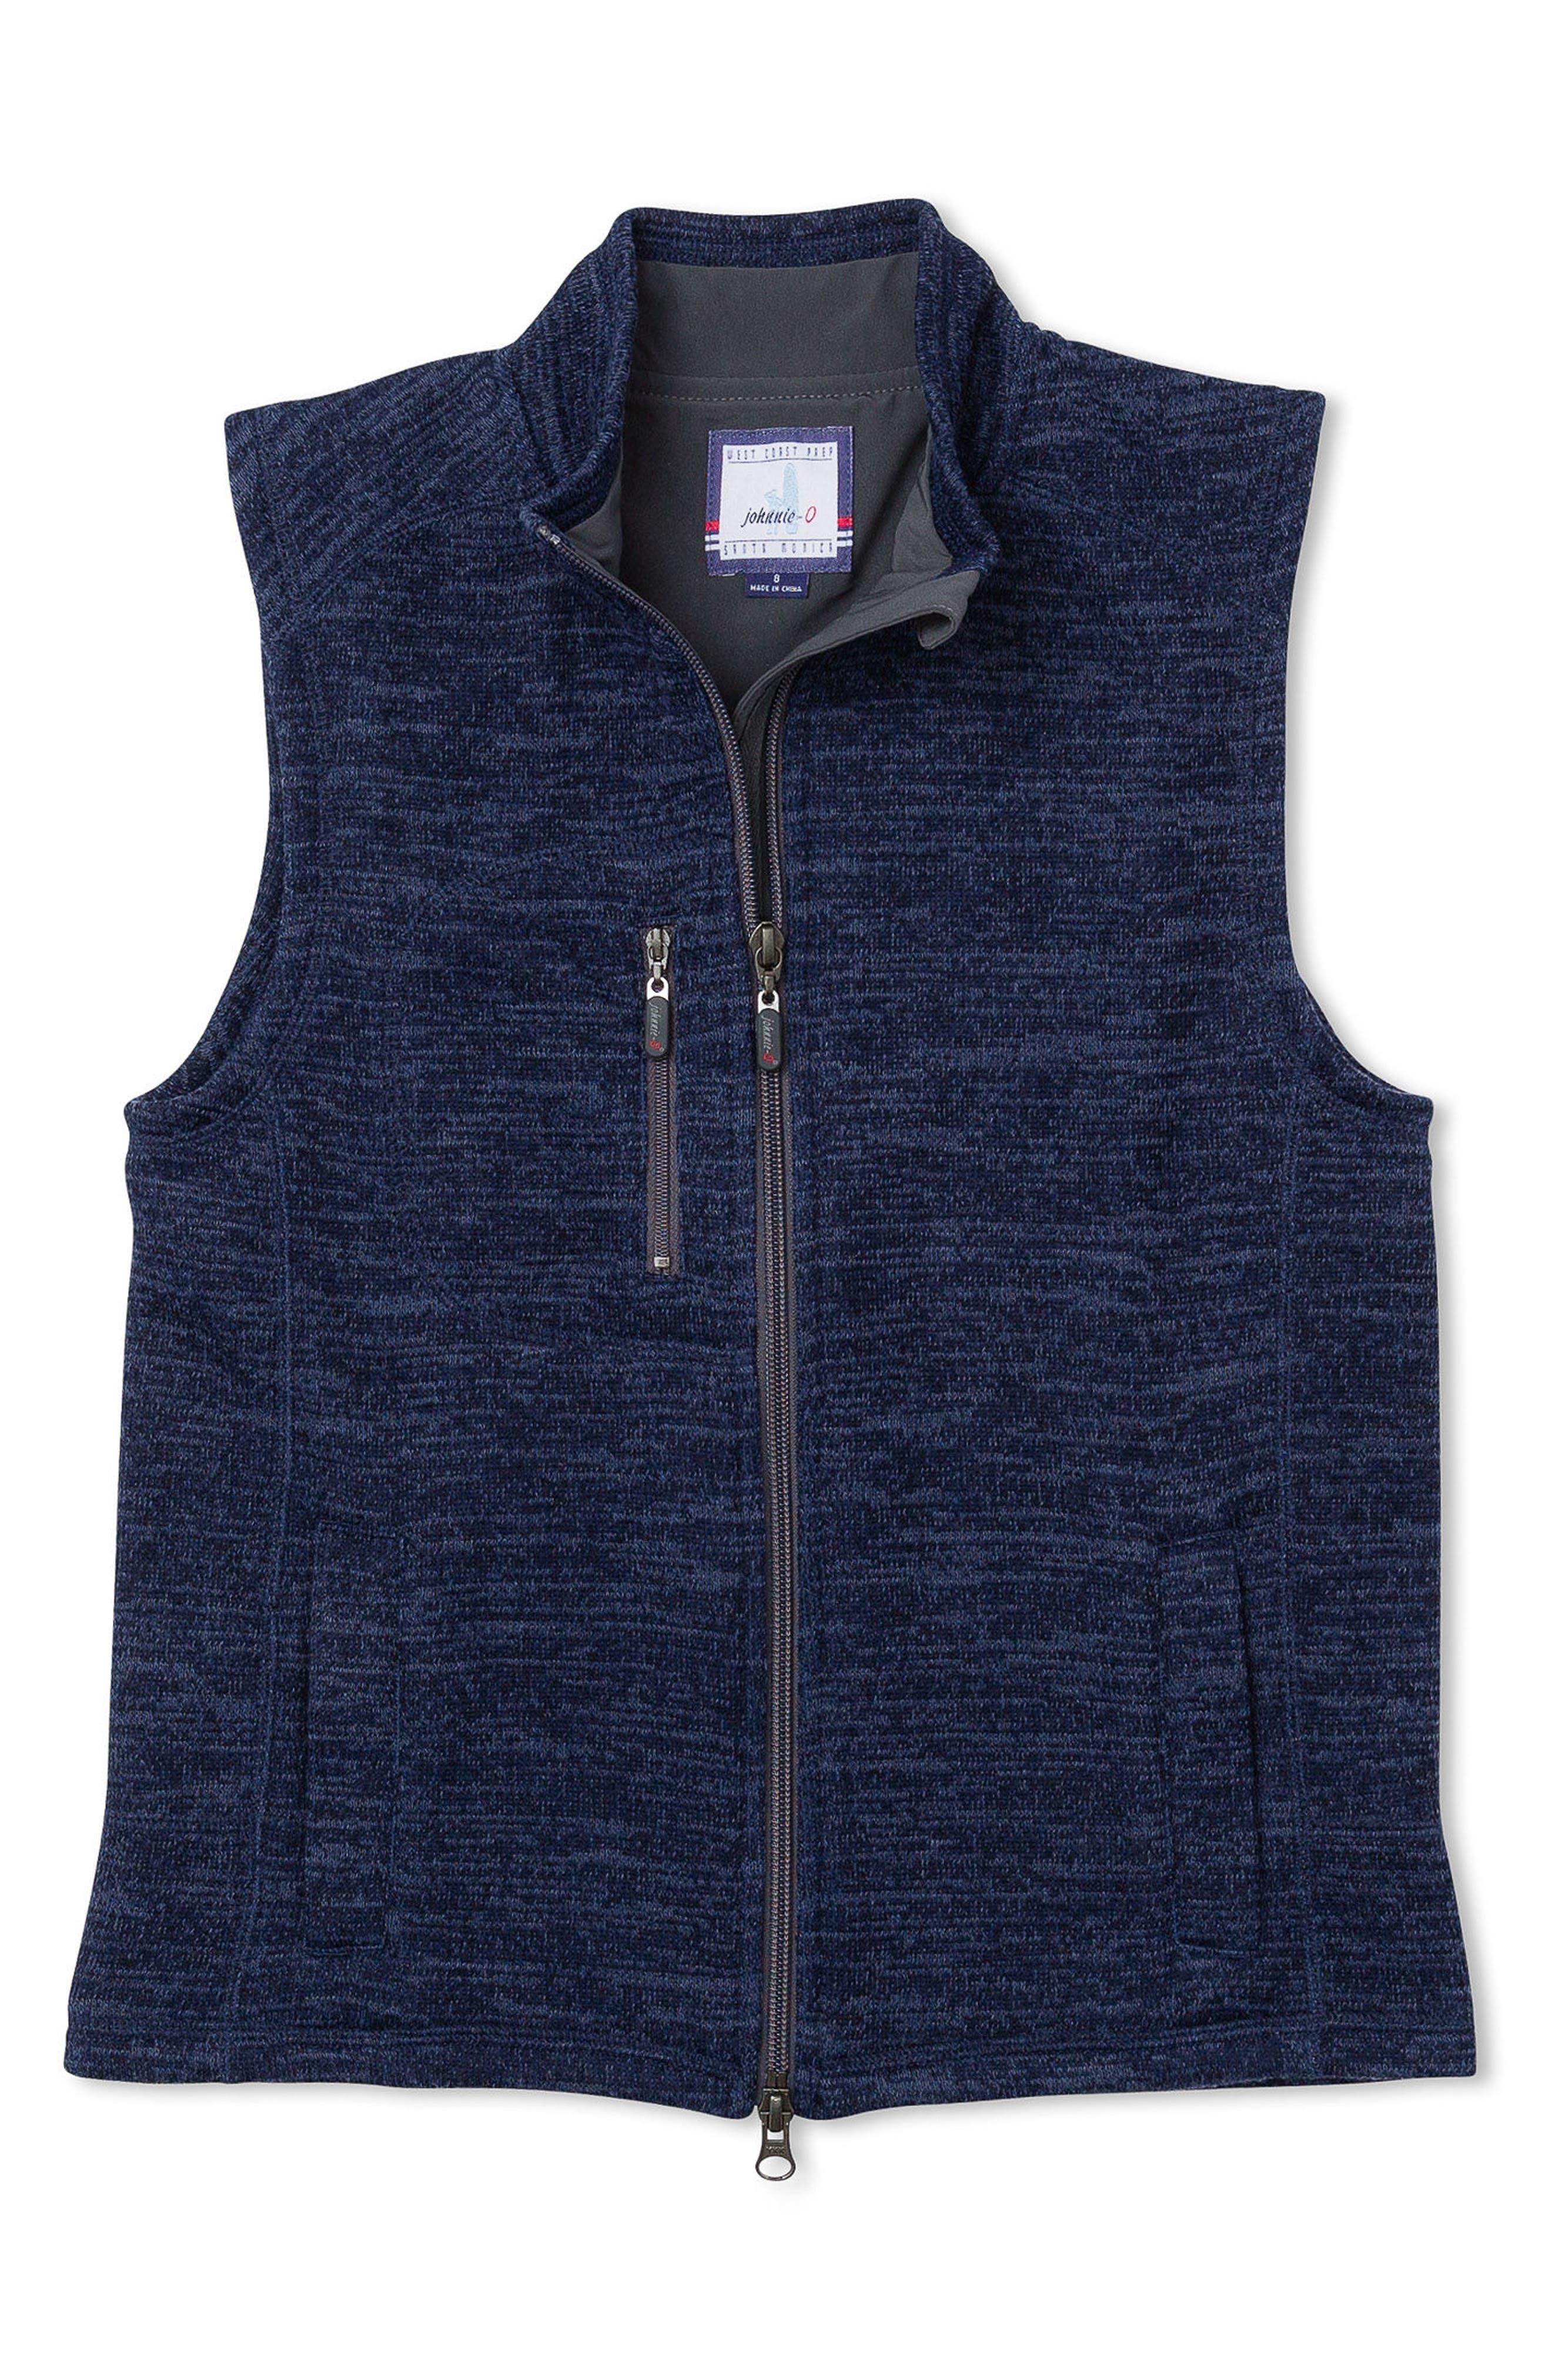 Main Image - johnnie-O Tahoe Zip Vest (Little Boys & Big Boys)